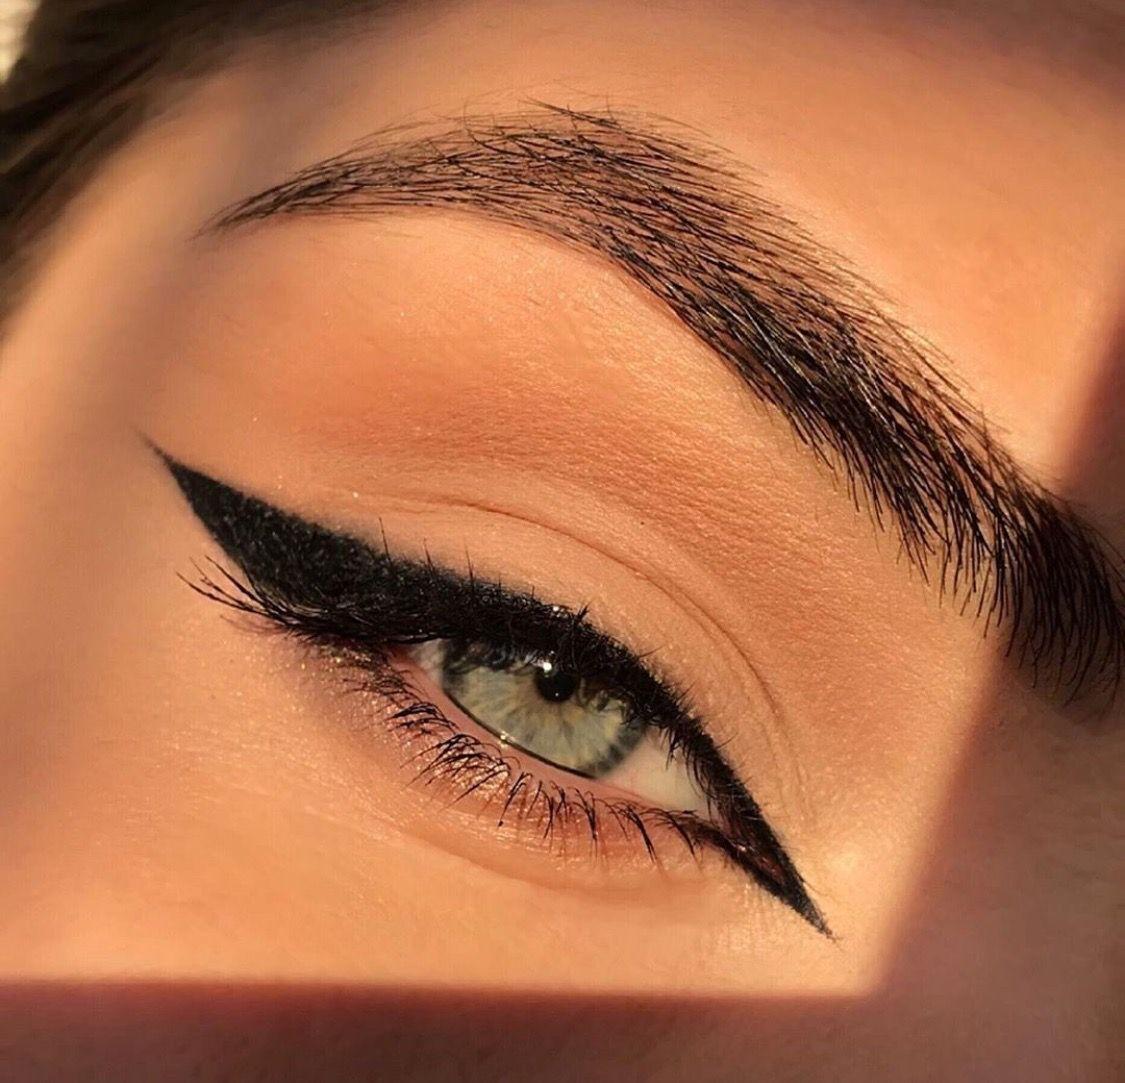 🎄ⓟⓘⓝ ❤︎ @ brianaa0122🎄 in 2020 | Makeup eyeliner, No eyeliner makeup, Cat eye  makeup